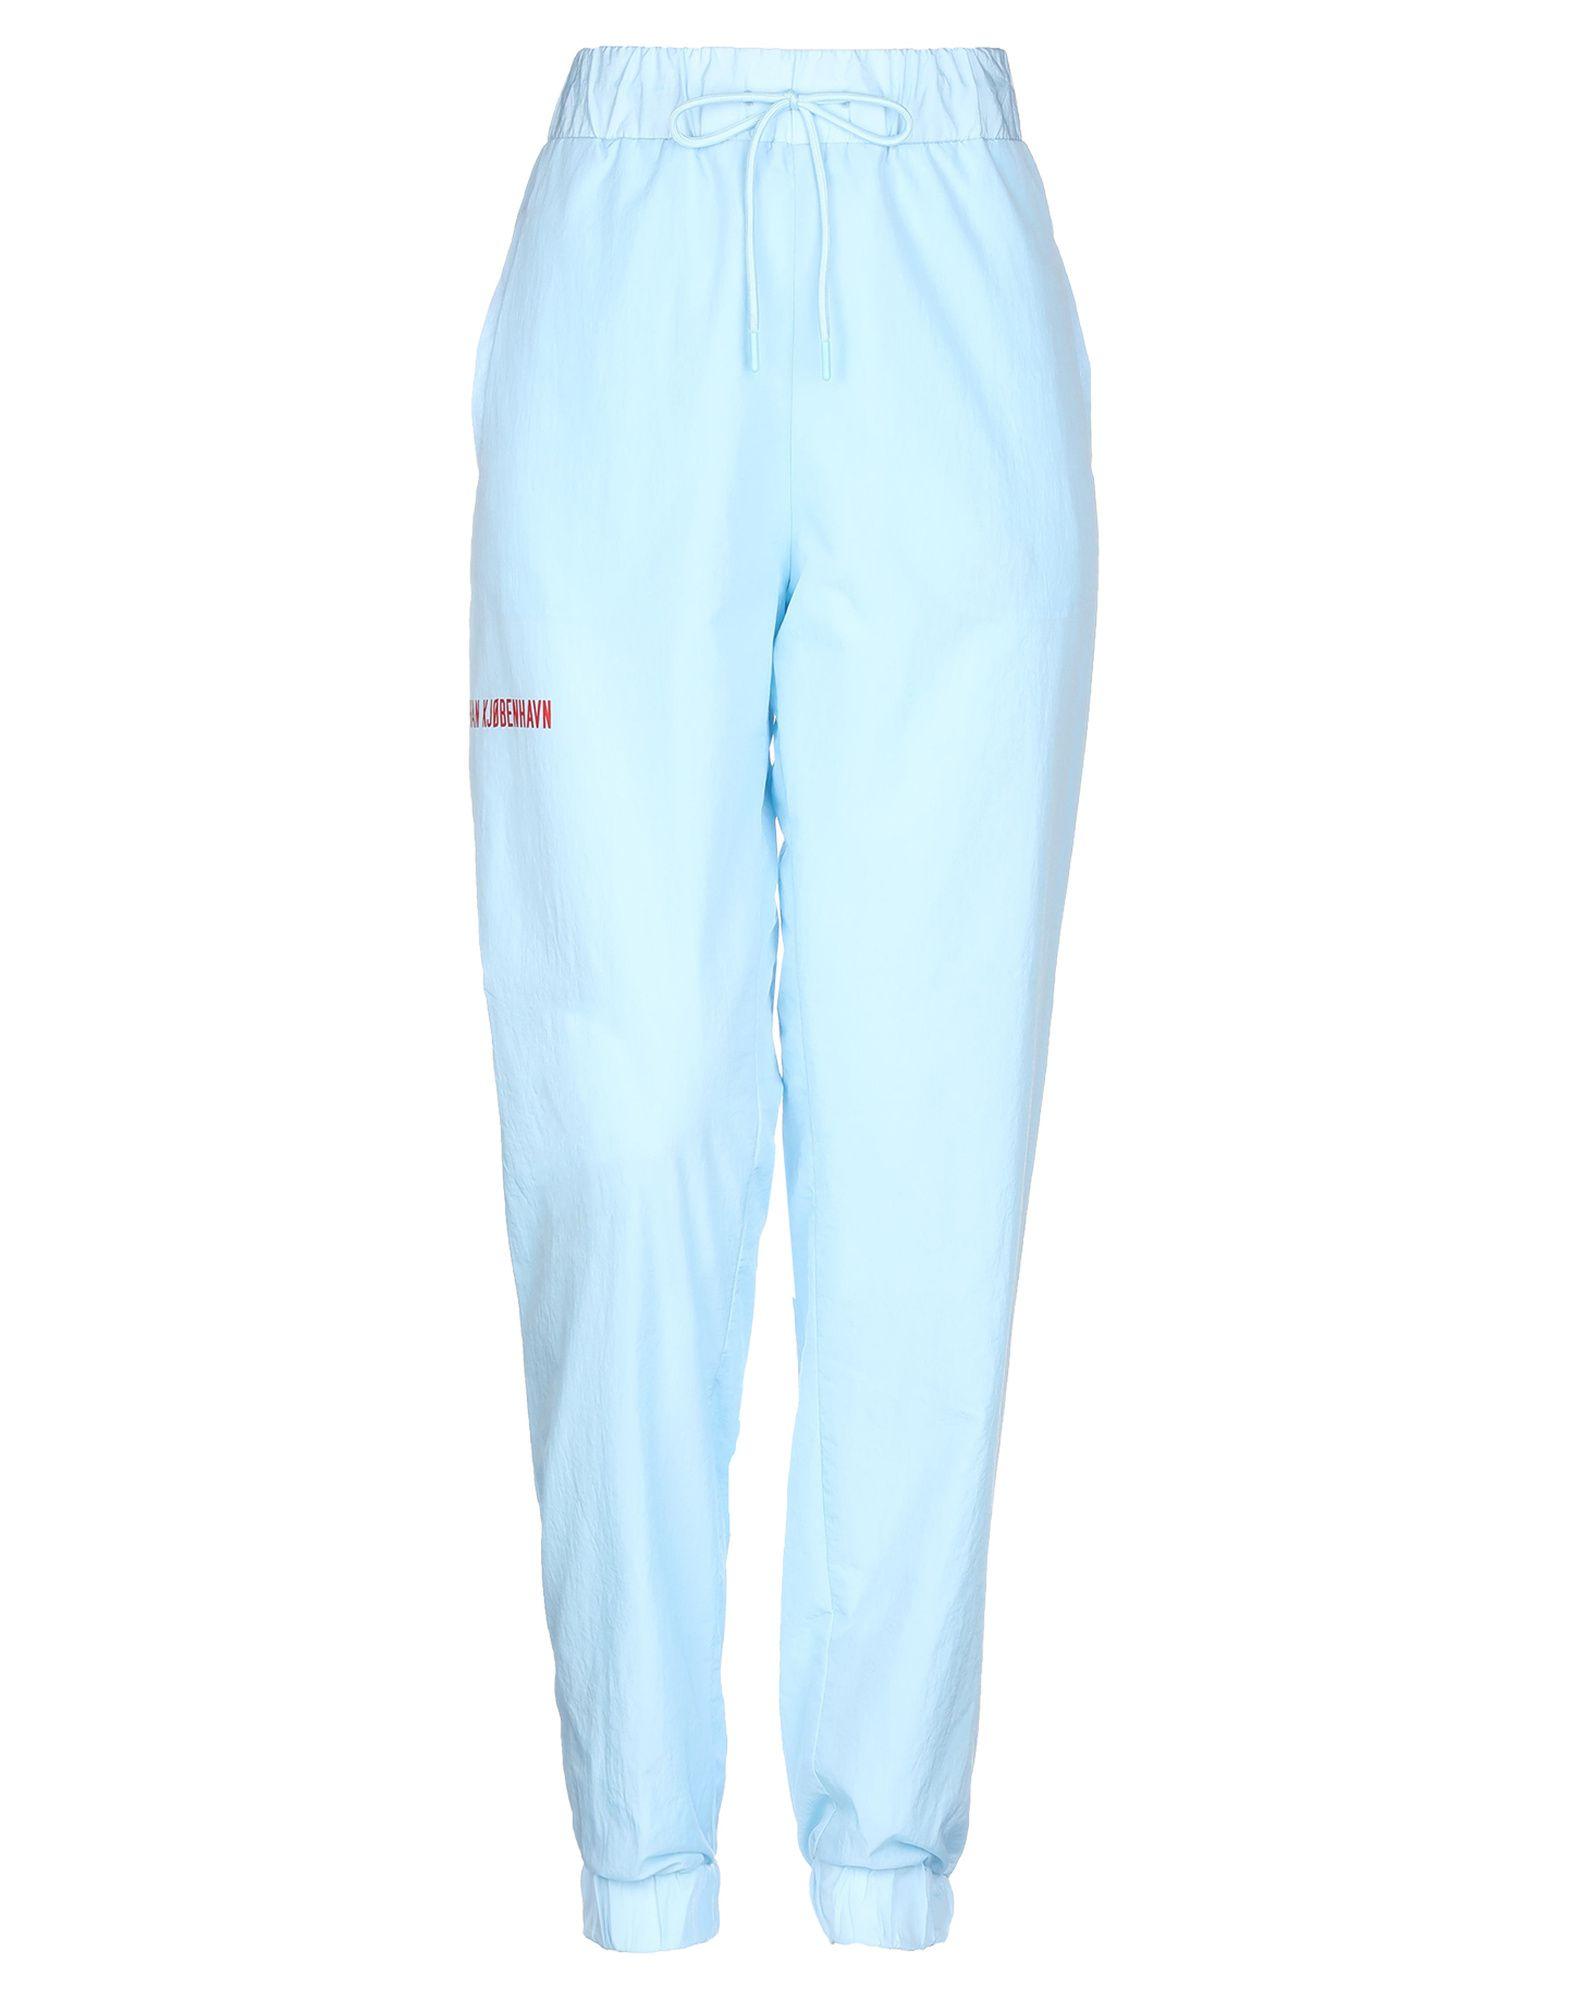 HAN KJØBENHAVN Повседневные брюки han kjøbenhavn джинсовые брюки